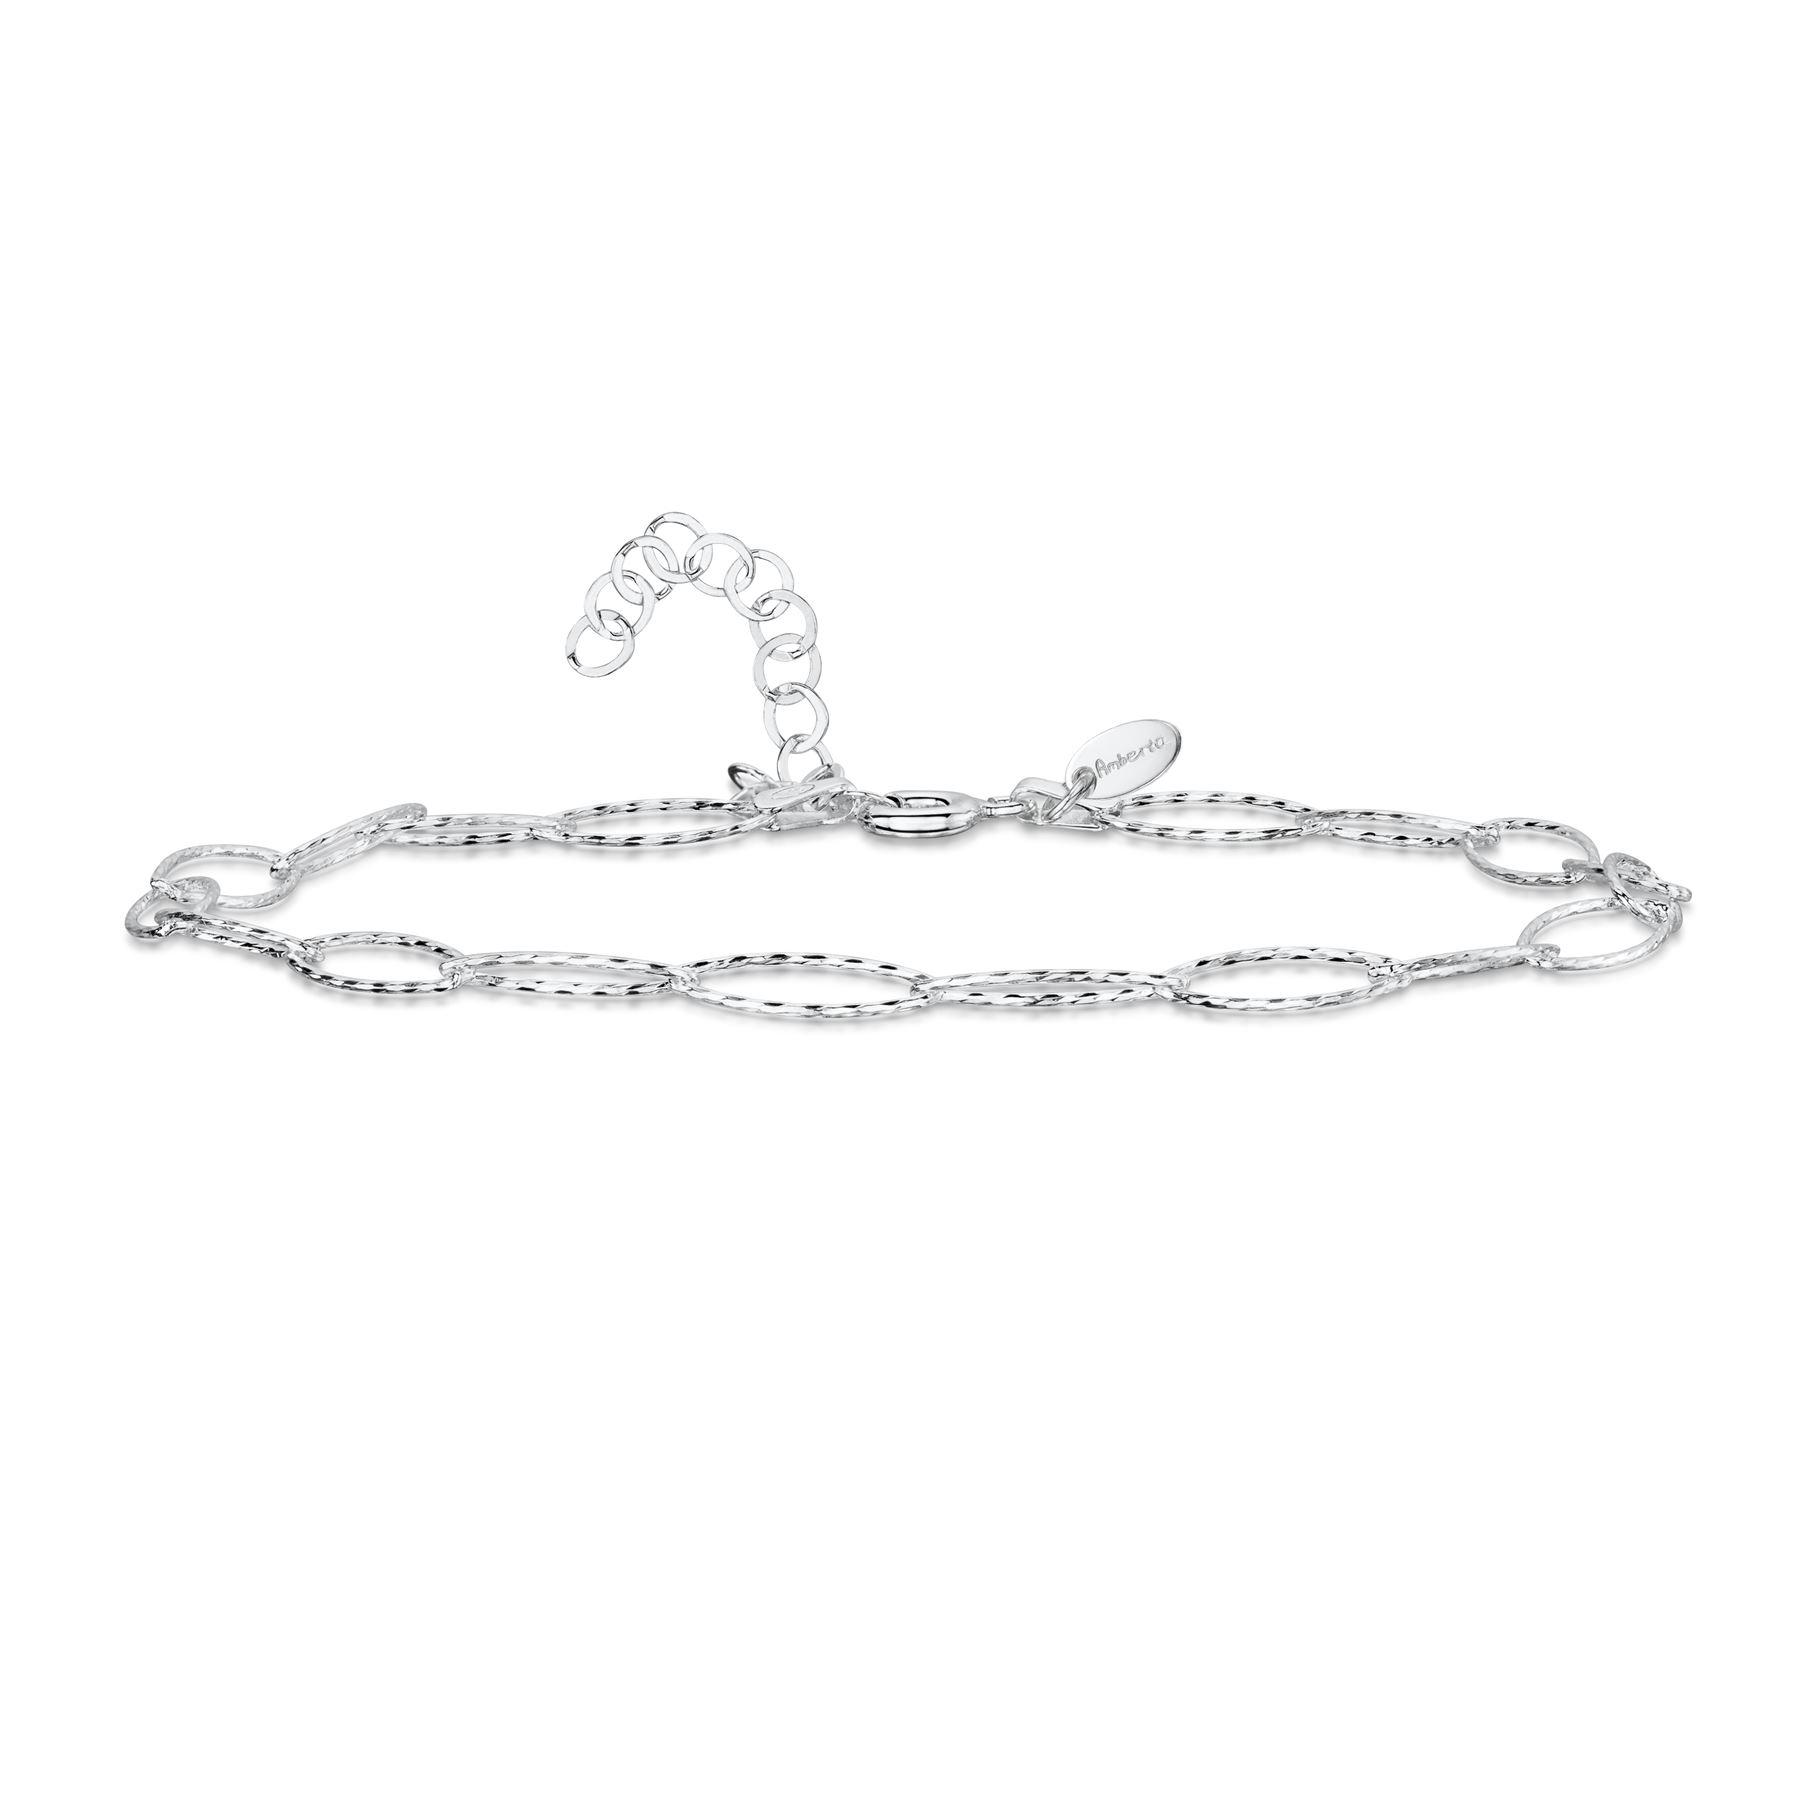 Amberta-Jewelry-925-Sterling-Silver-Adjustable-Anklet-Foot-Bracelet-for-Women miniature 53